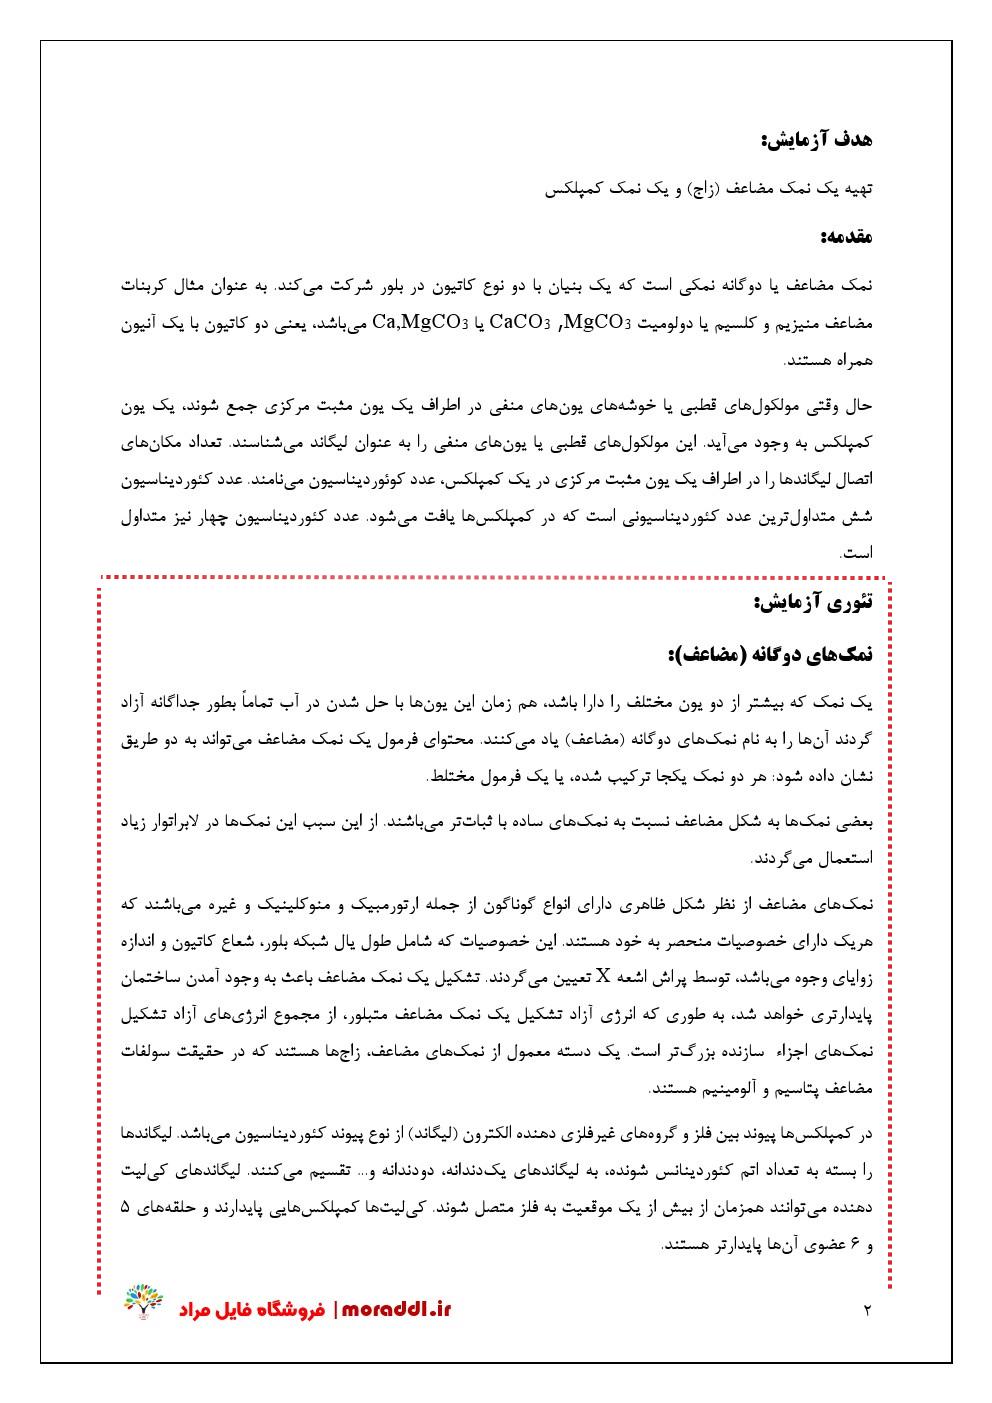 نحوه ی نوشتن گزارش کار 03